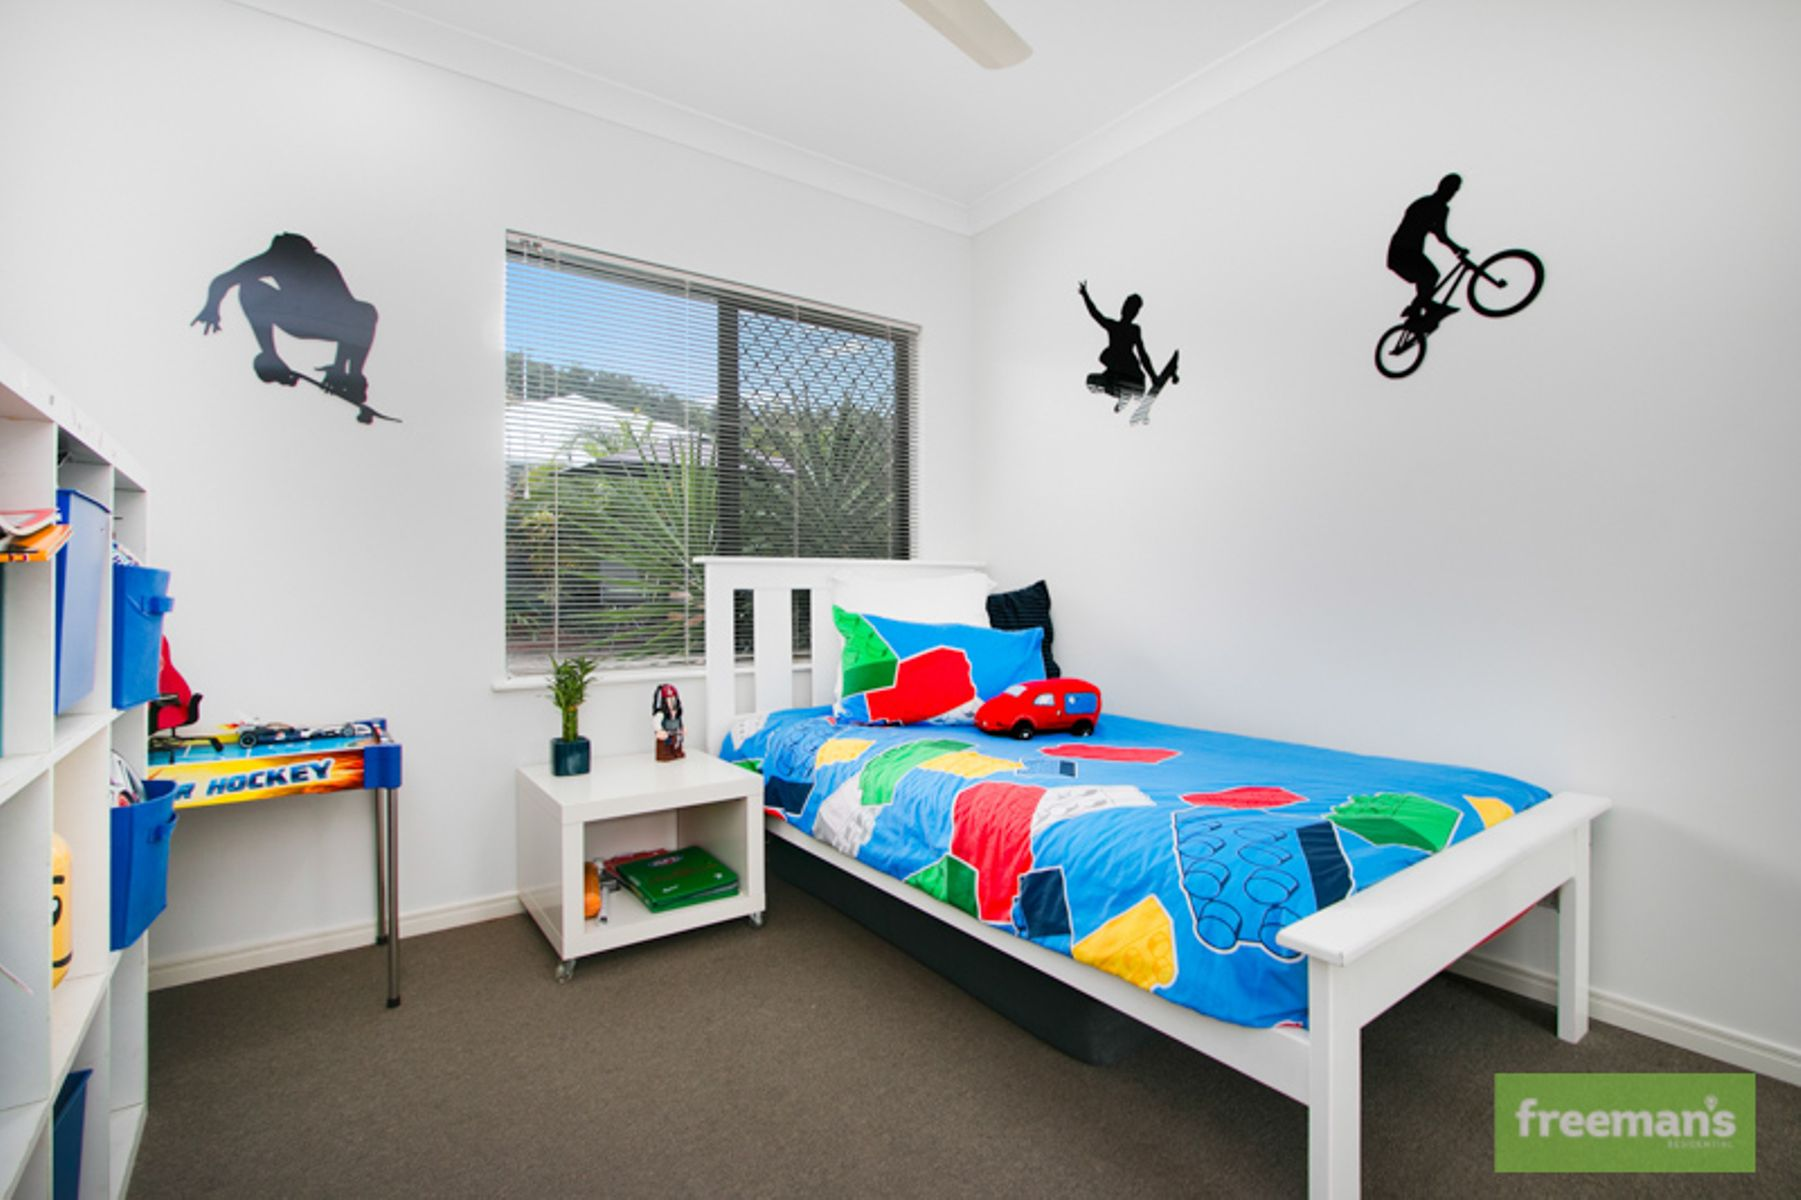 Freemans Residential :: 92 Roberts Drive, TRINITY BEACH, QLD 4879